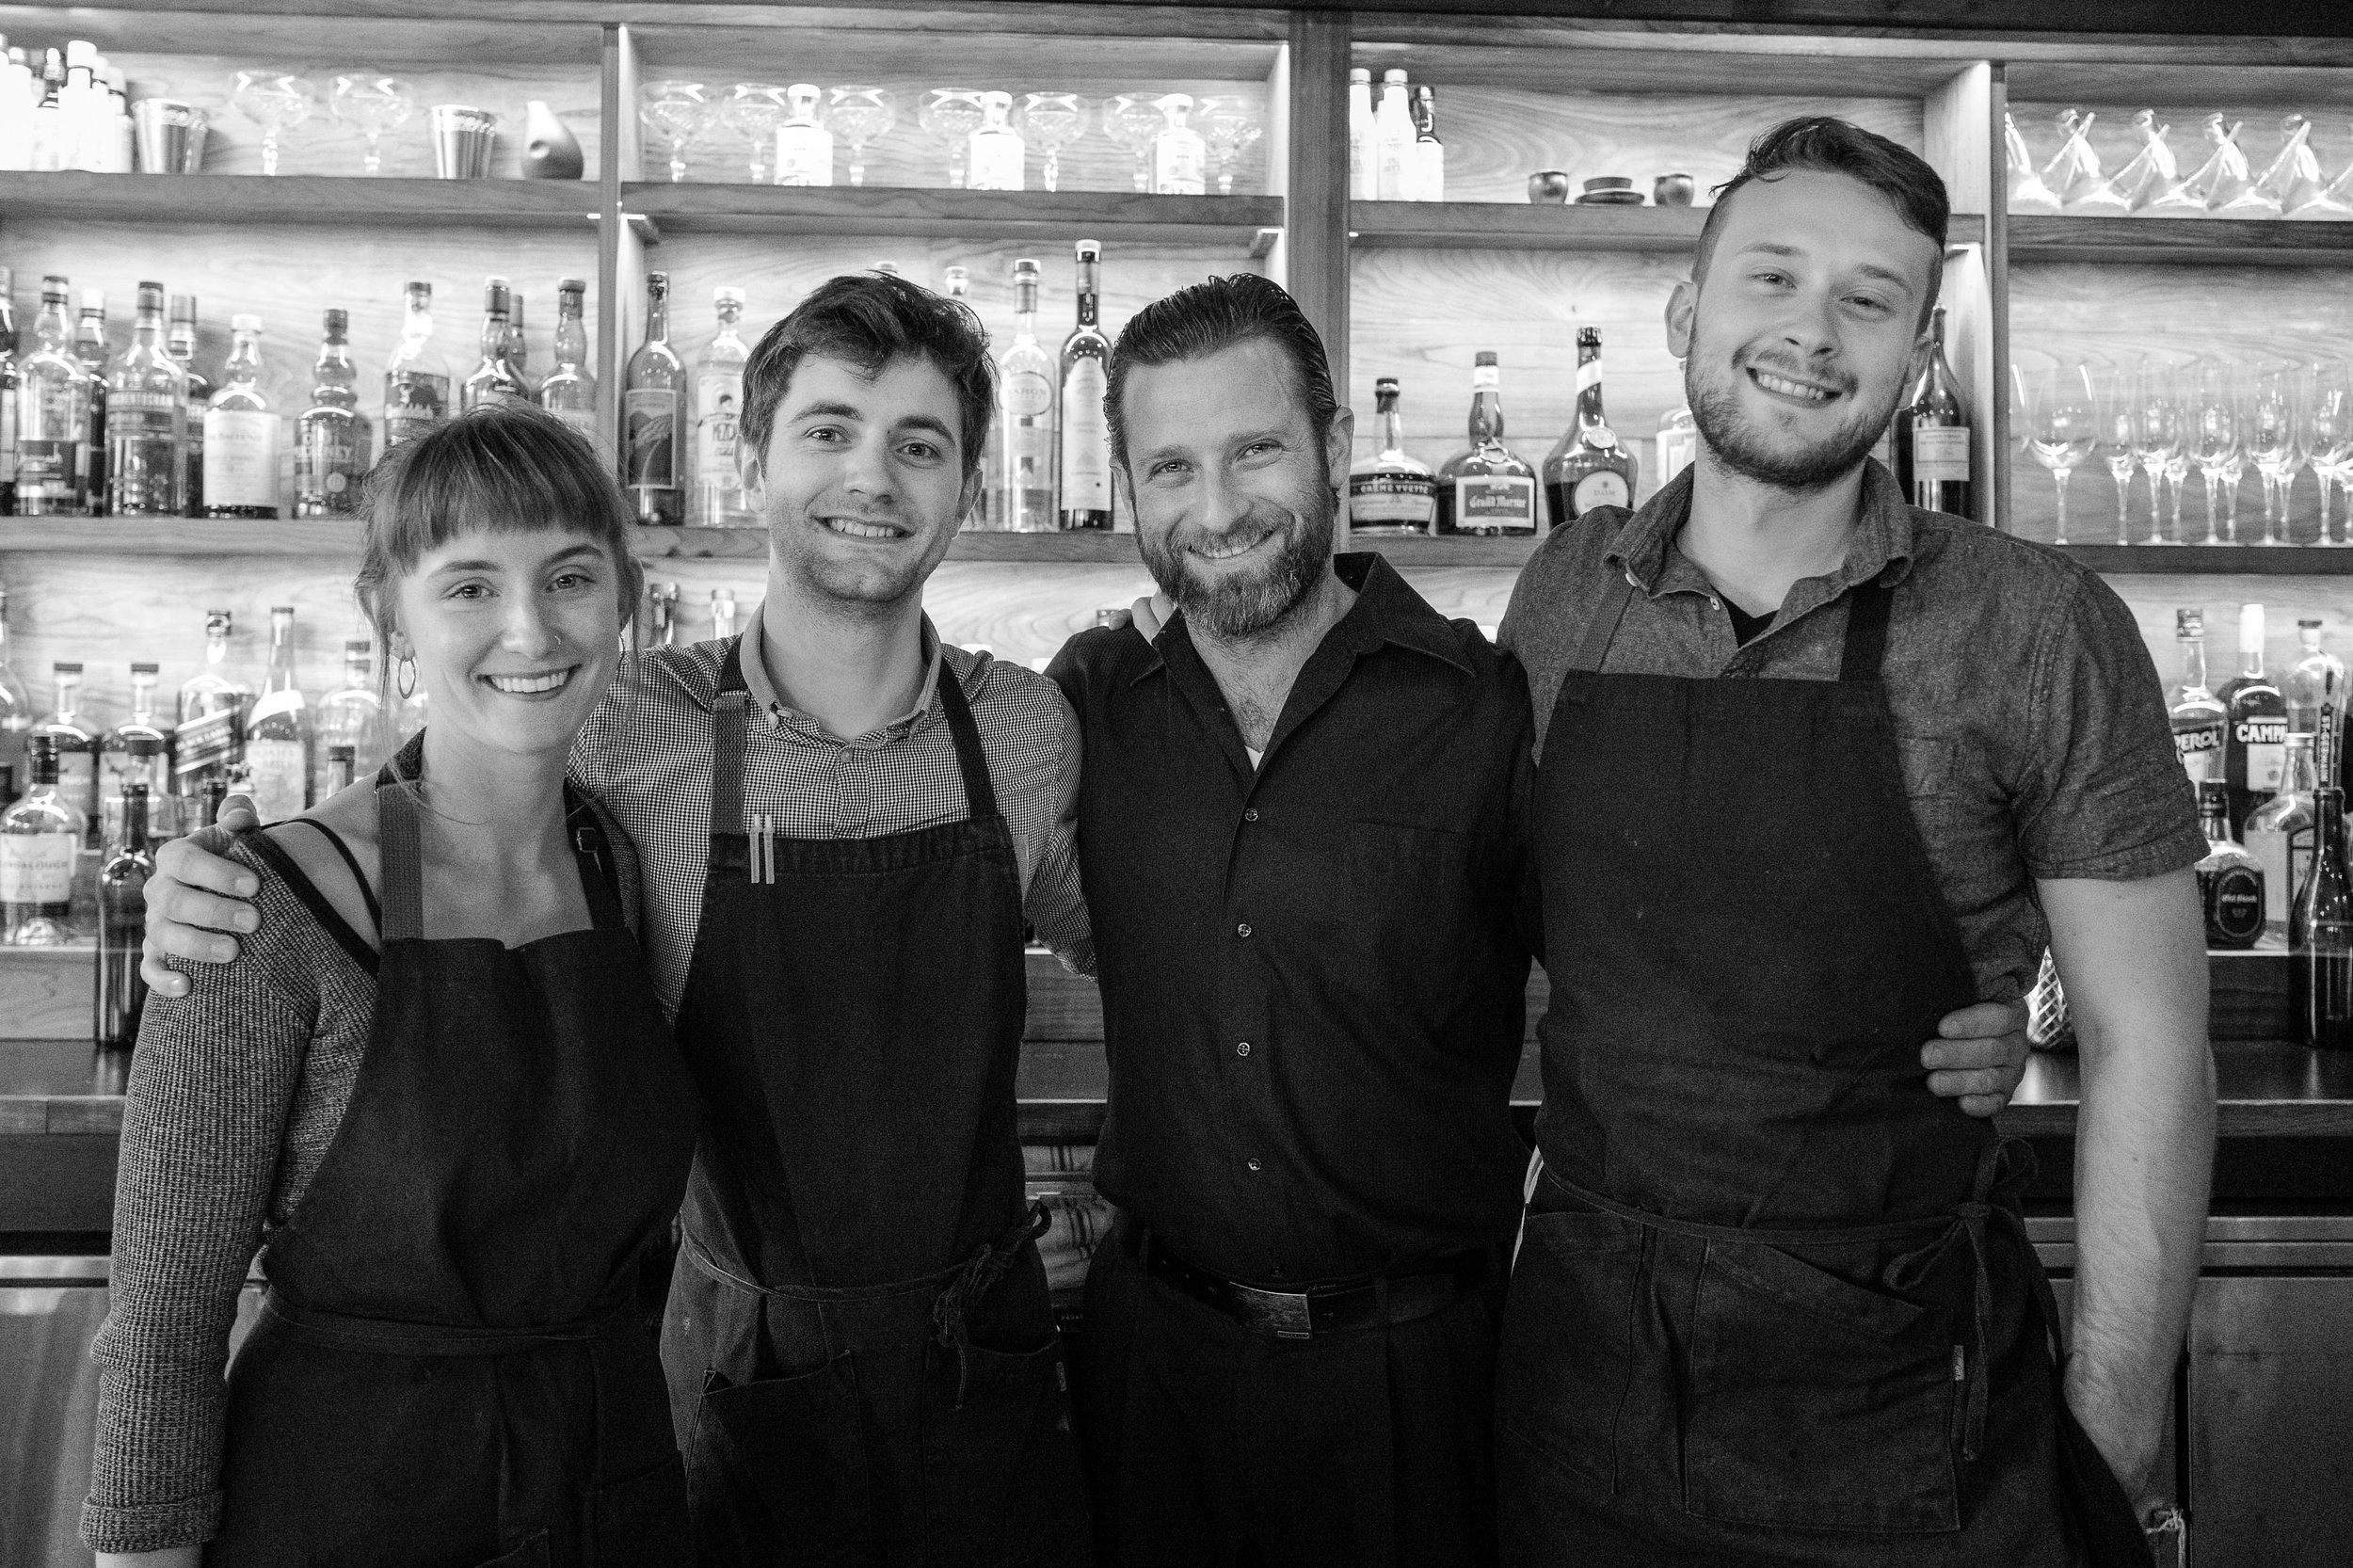 Bar Team by Colin Raney